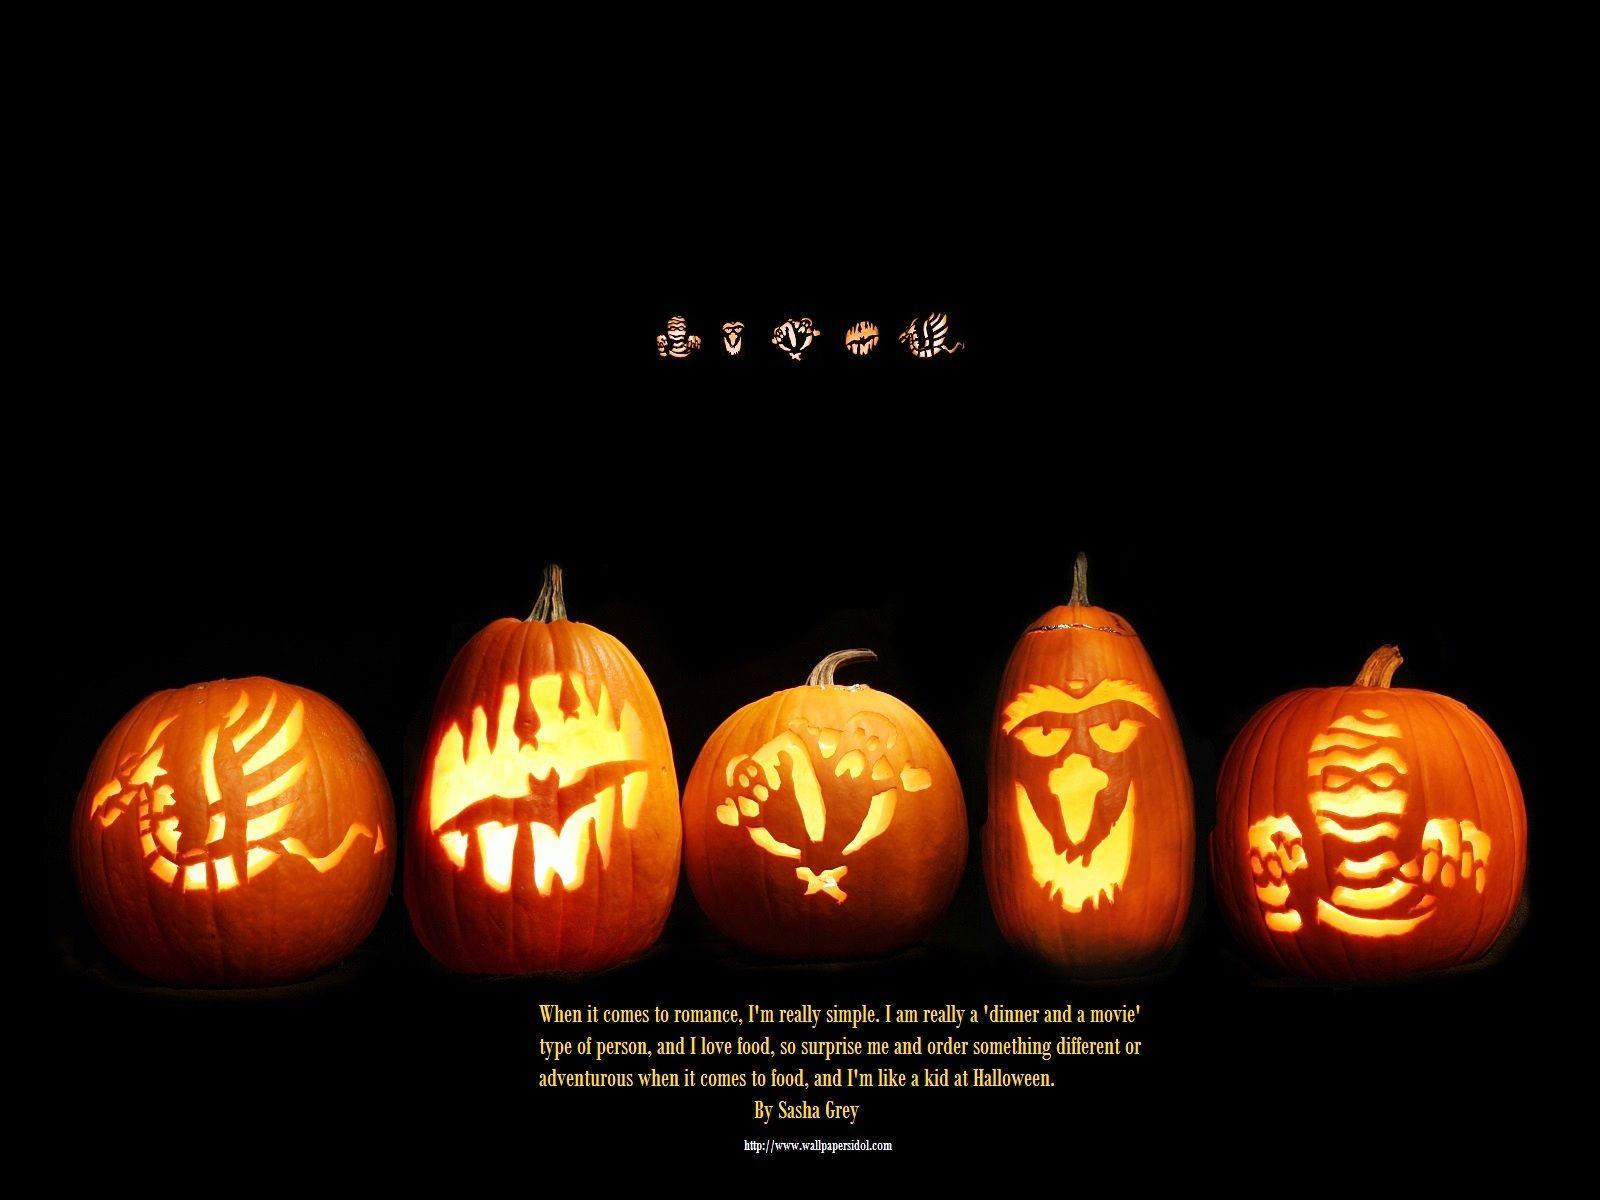 halloween slogans - Halloween Slogans